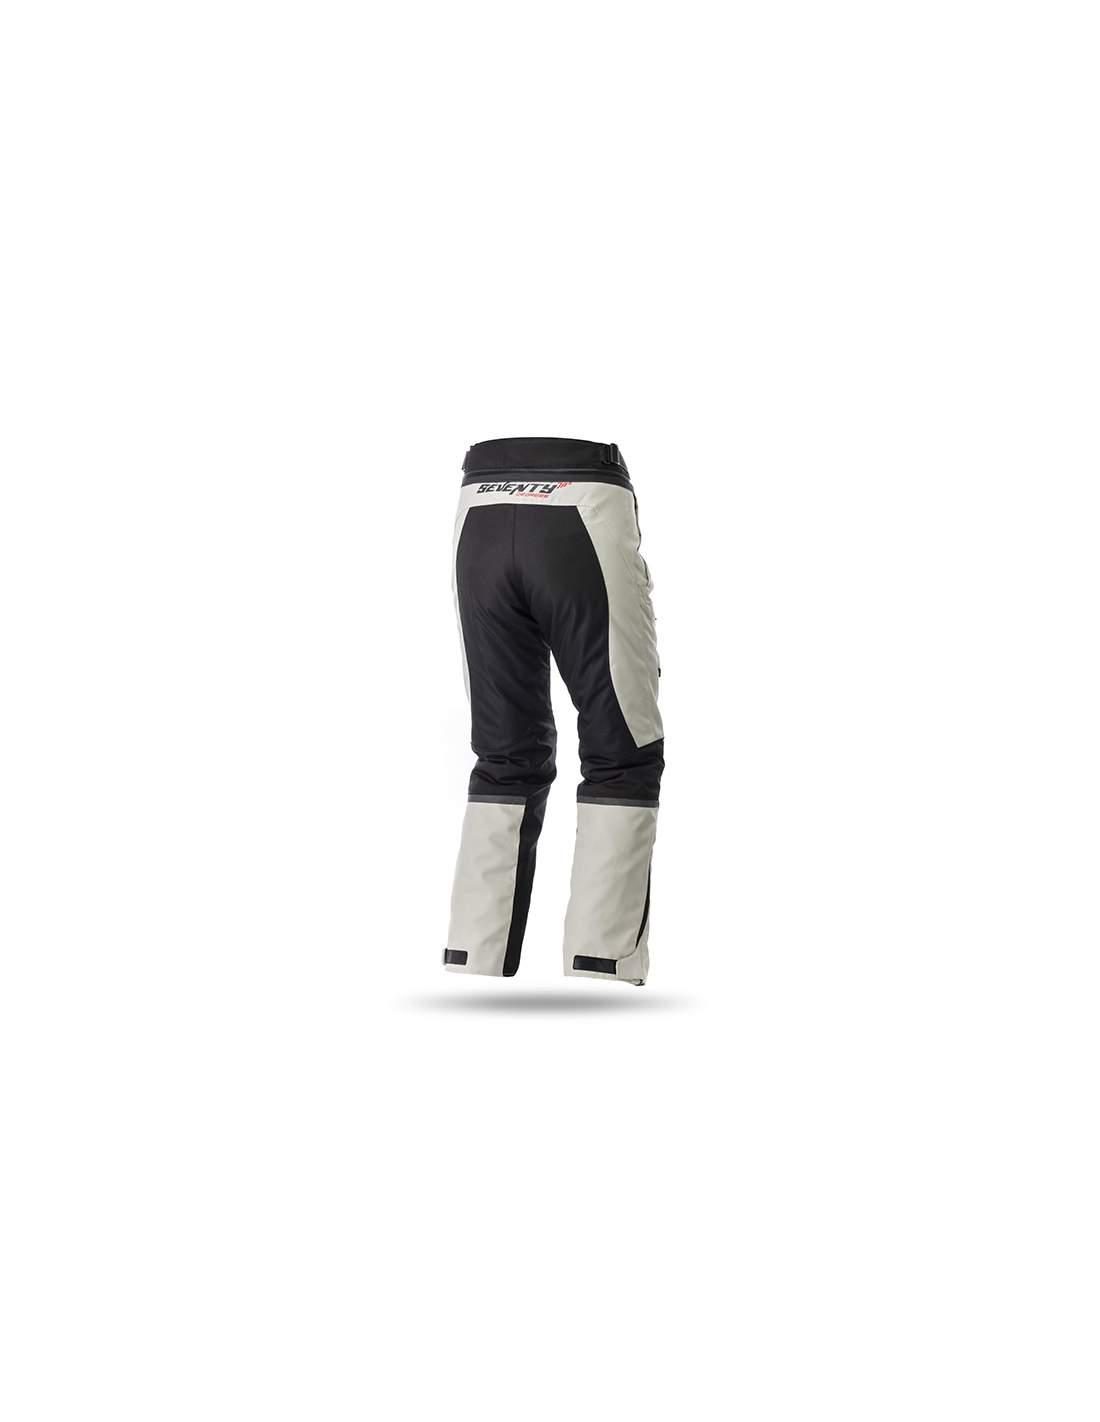 Pantalon Sd Pt1 Invierno Touring Unisex Negro Gris